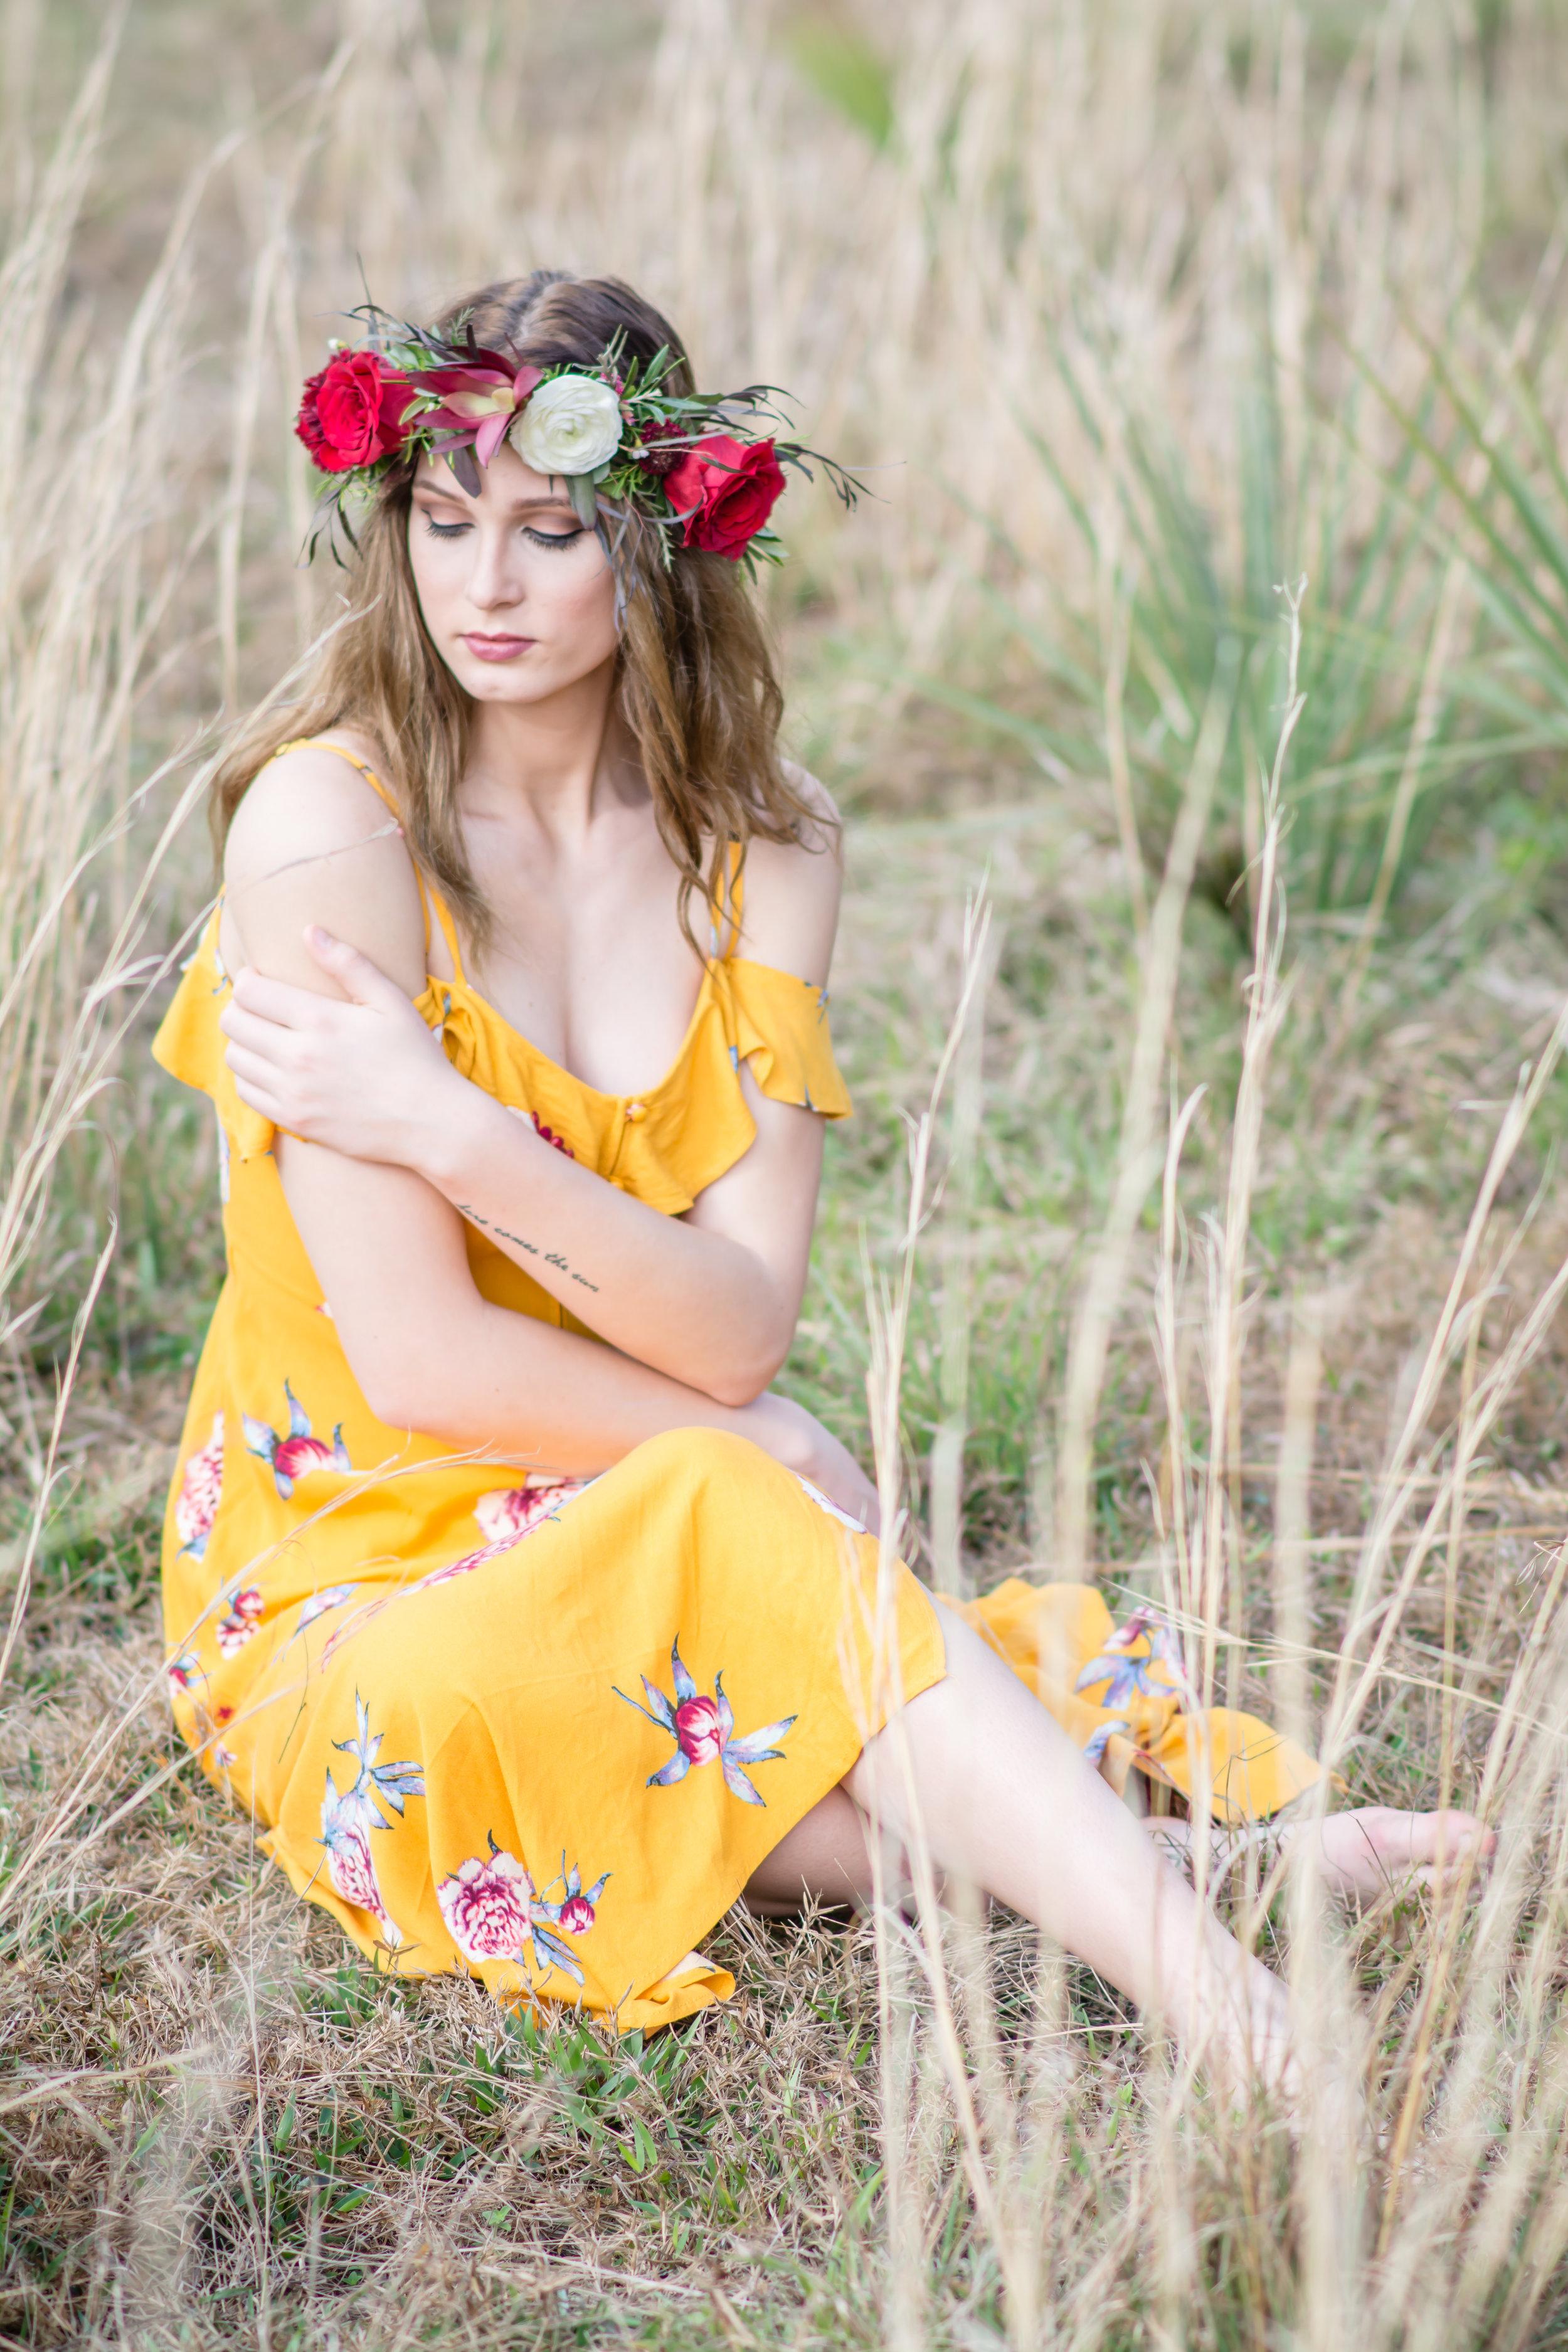 floral-headpiece-fashion-photoshoot-geneva-central-florida-photographer-yanitza-ninett-42.jpg